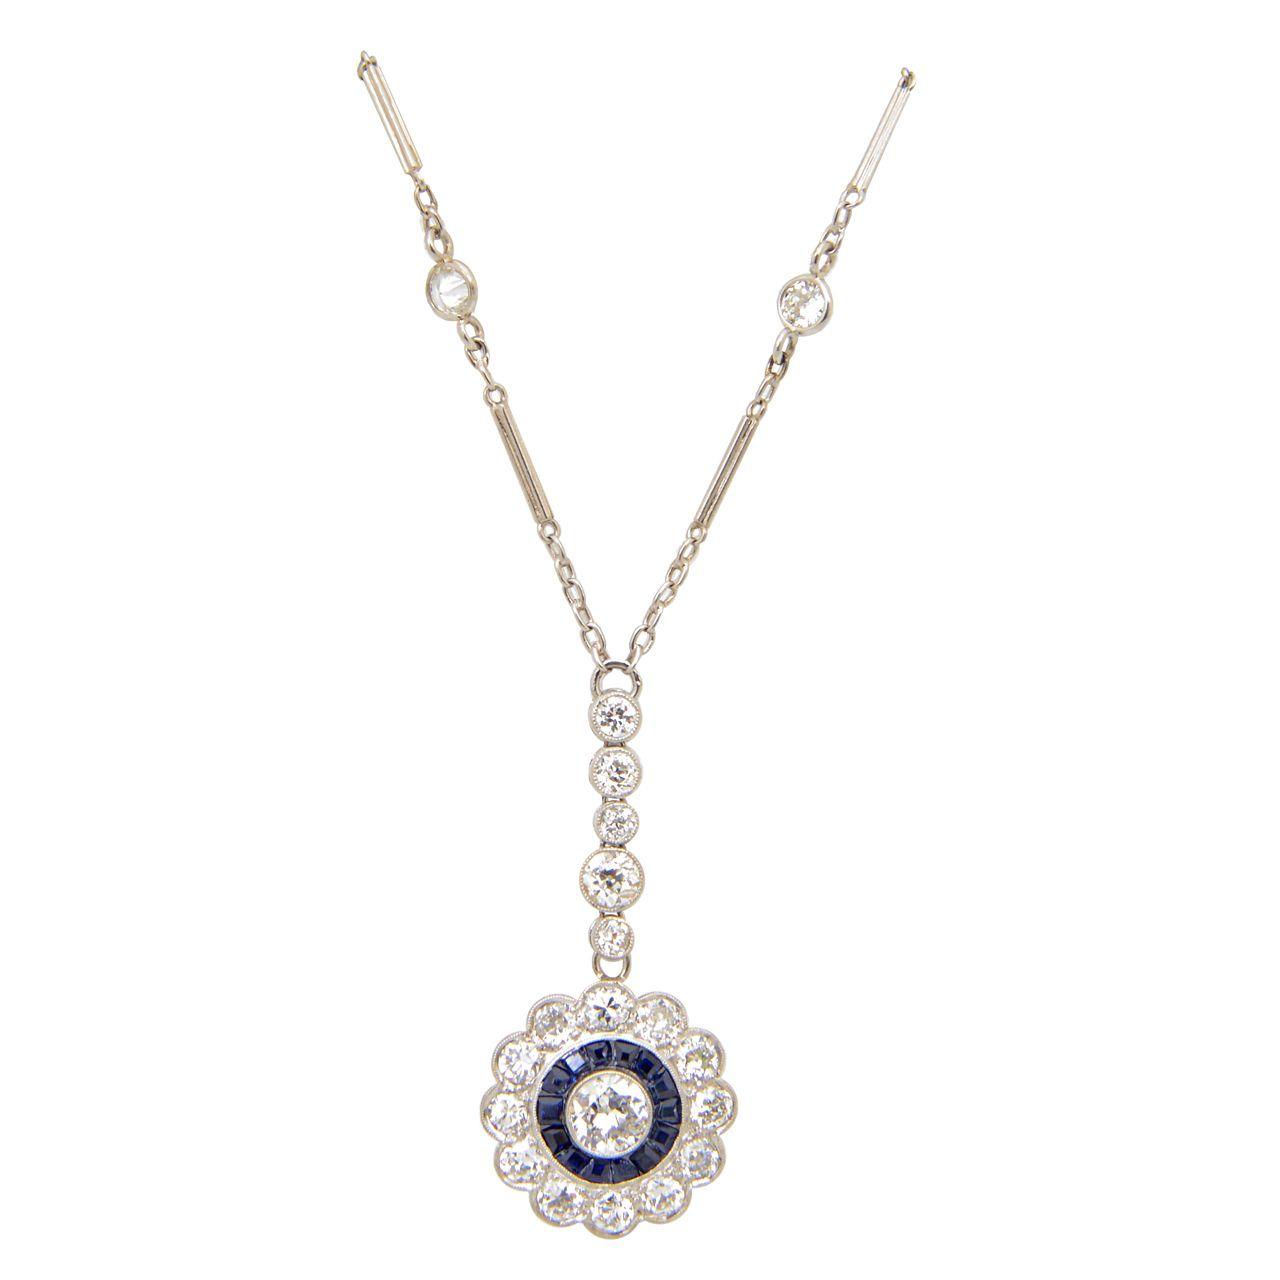 Art deco floral sapphire and diamond platinum drop pendant necklace art deco floral sapphire and diamond platinum drop pendant necklace aloadofball Choice Image